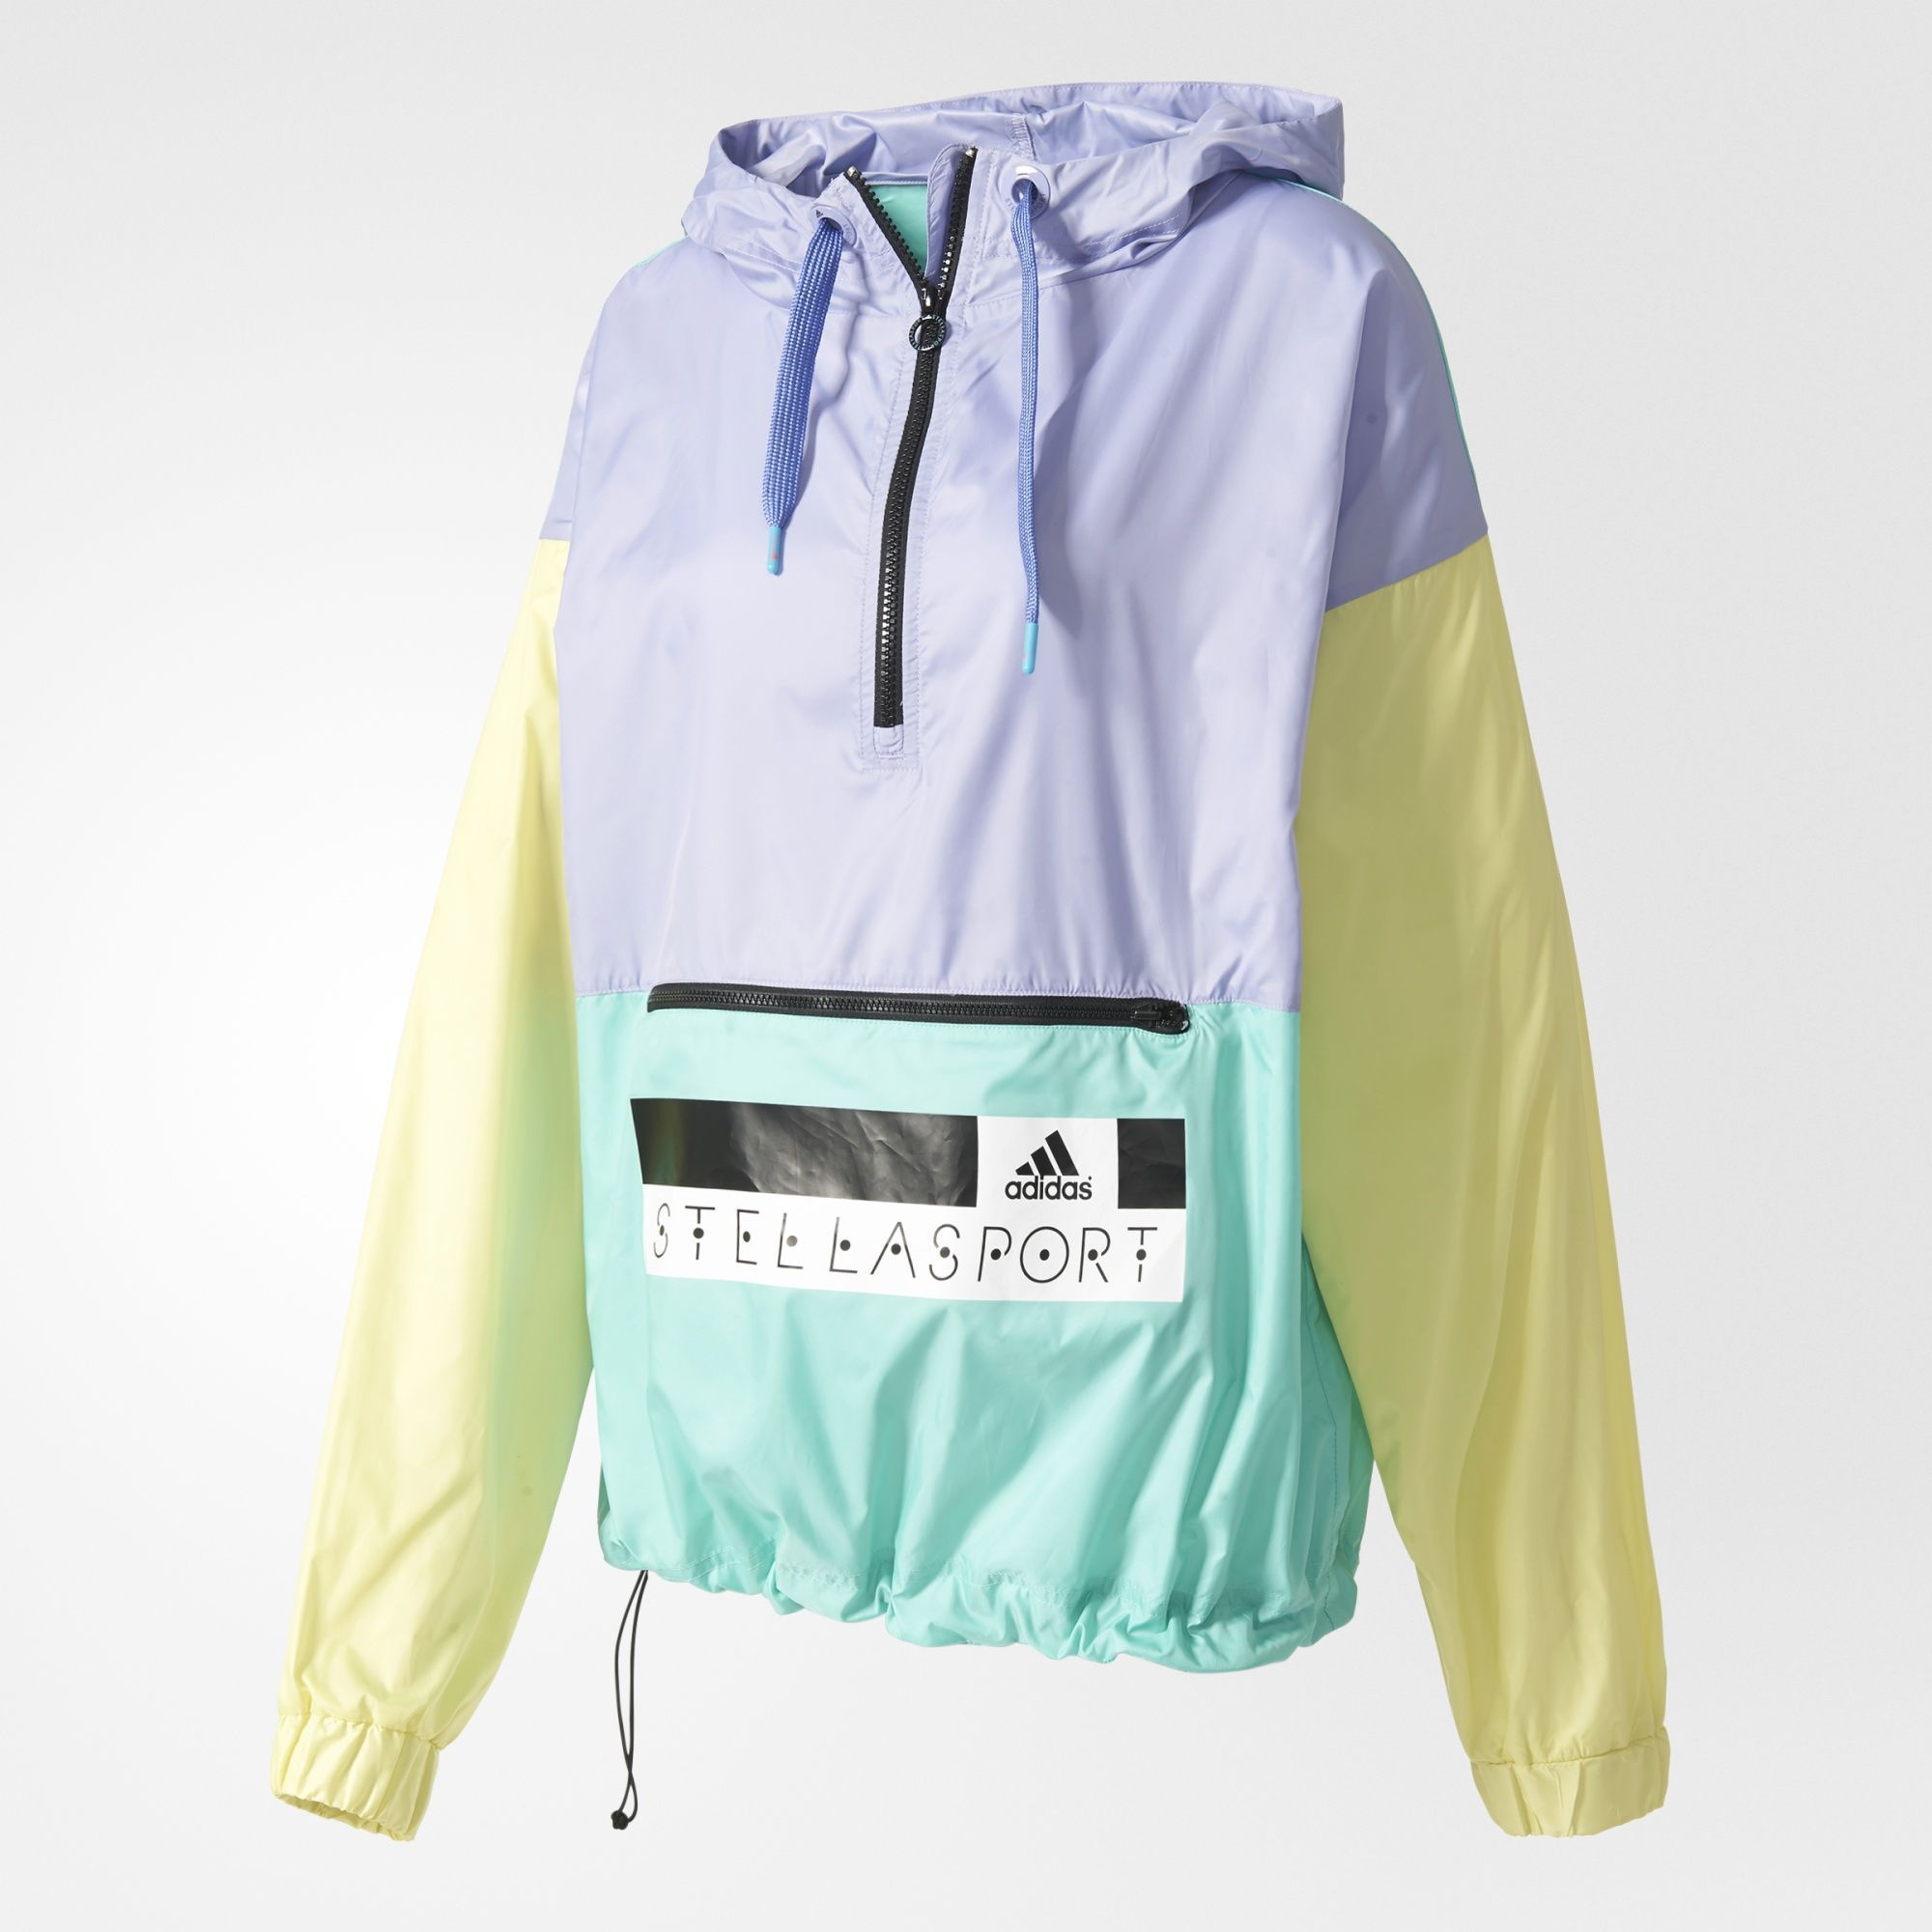 chaqueta chandal adidas retro, adidas Away Day Camisetas